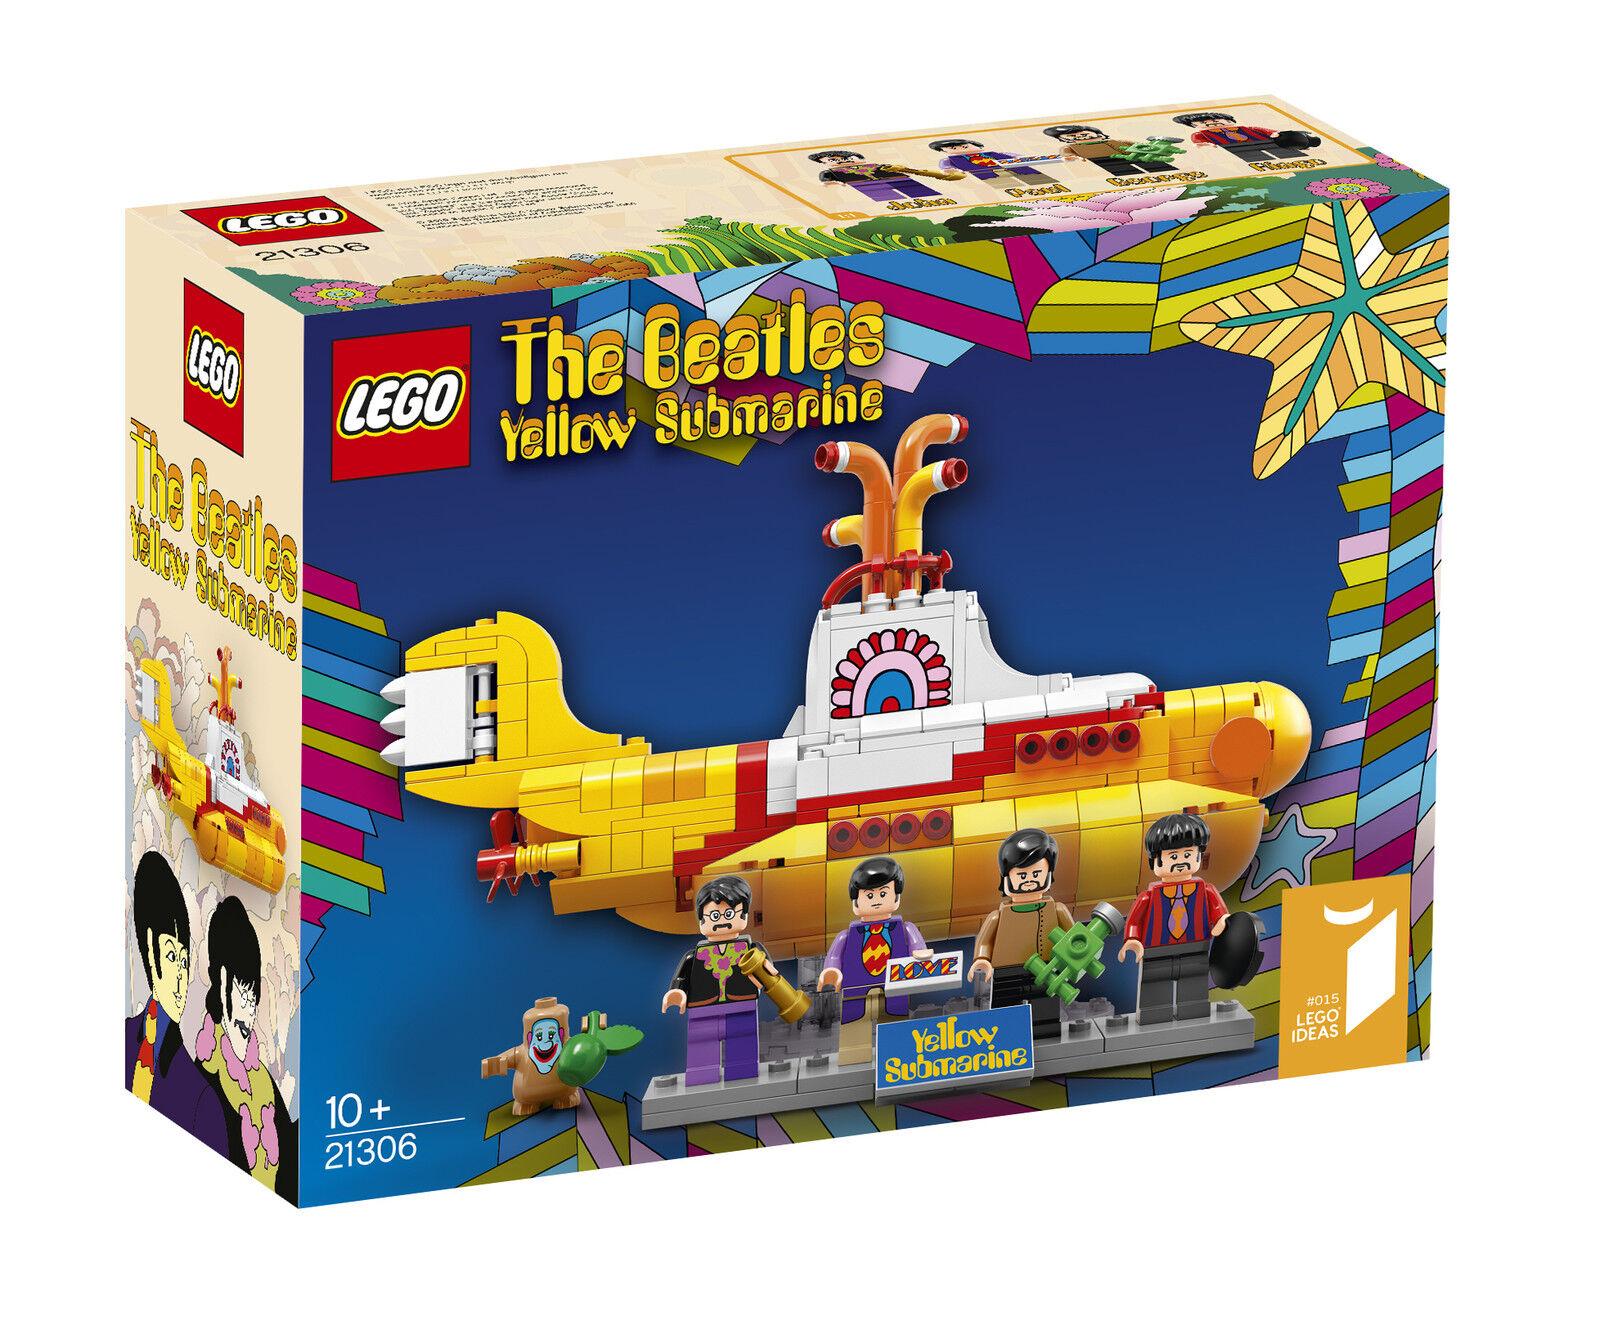 LEGO The Beatles Yellow Submarine 21306 - WORLDWIDE SHIPPING